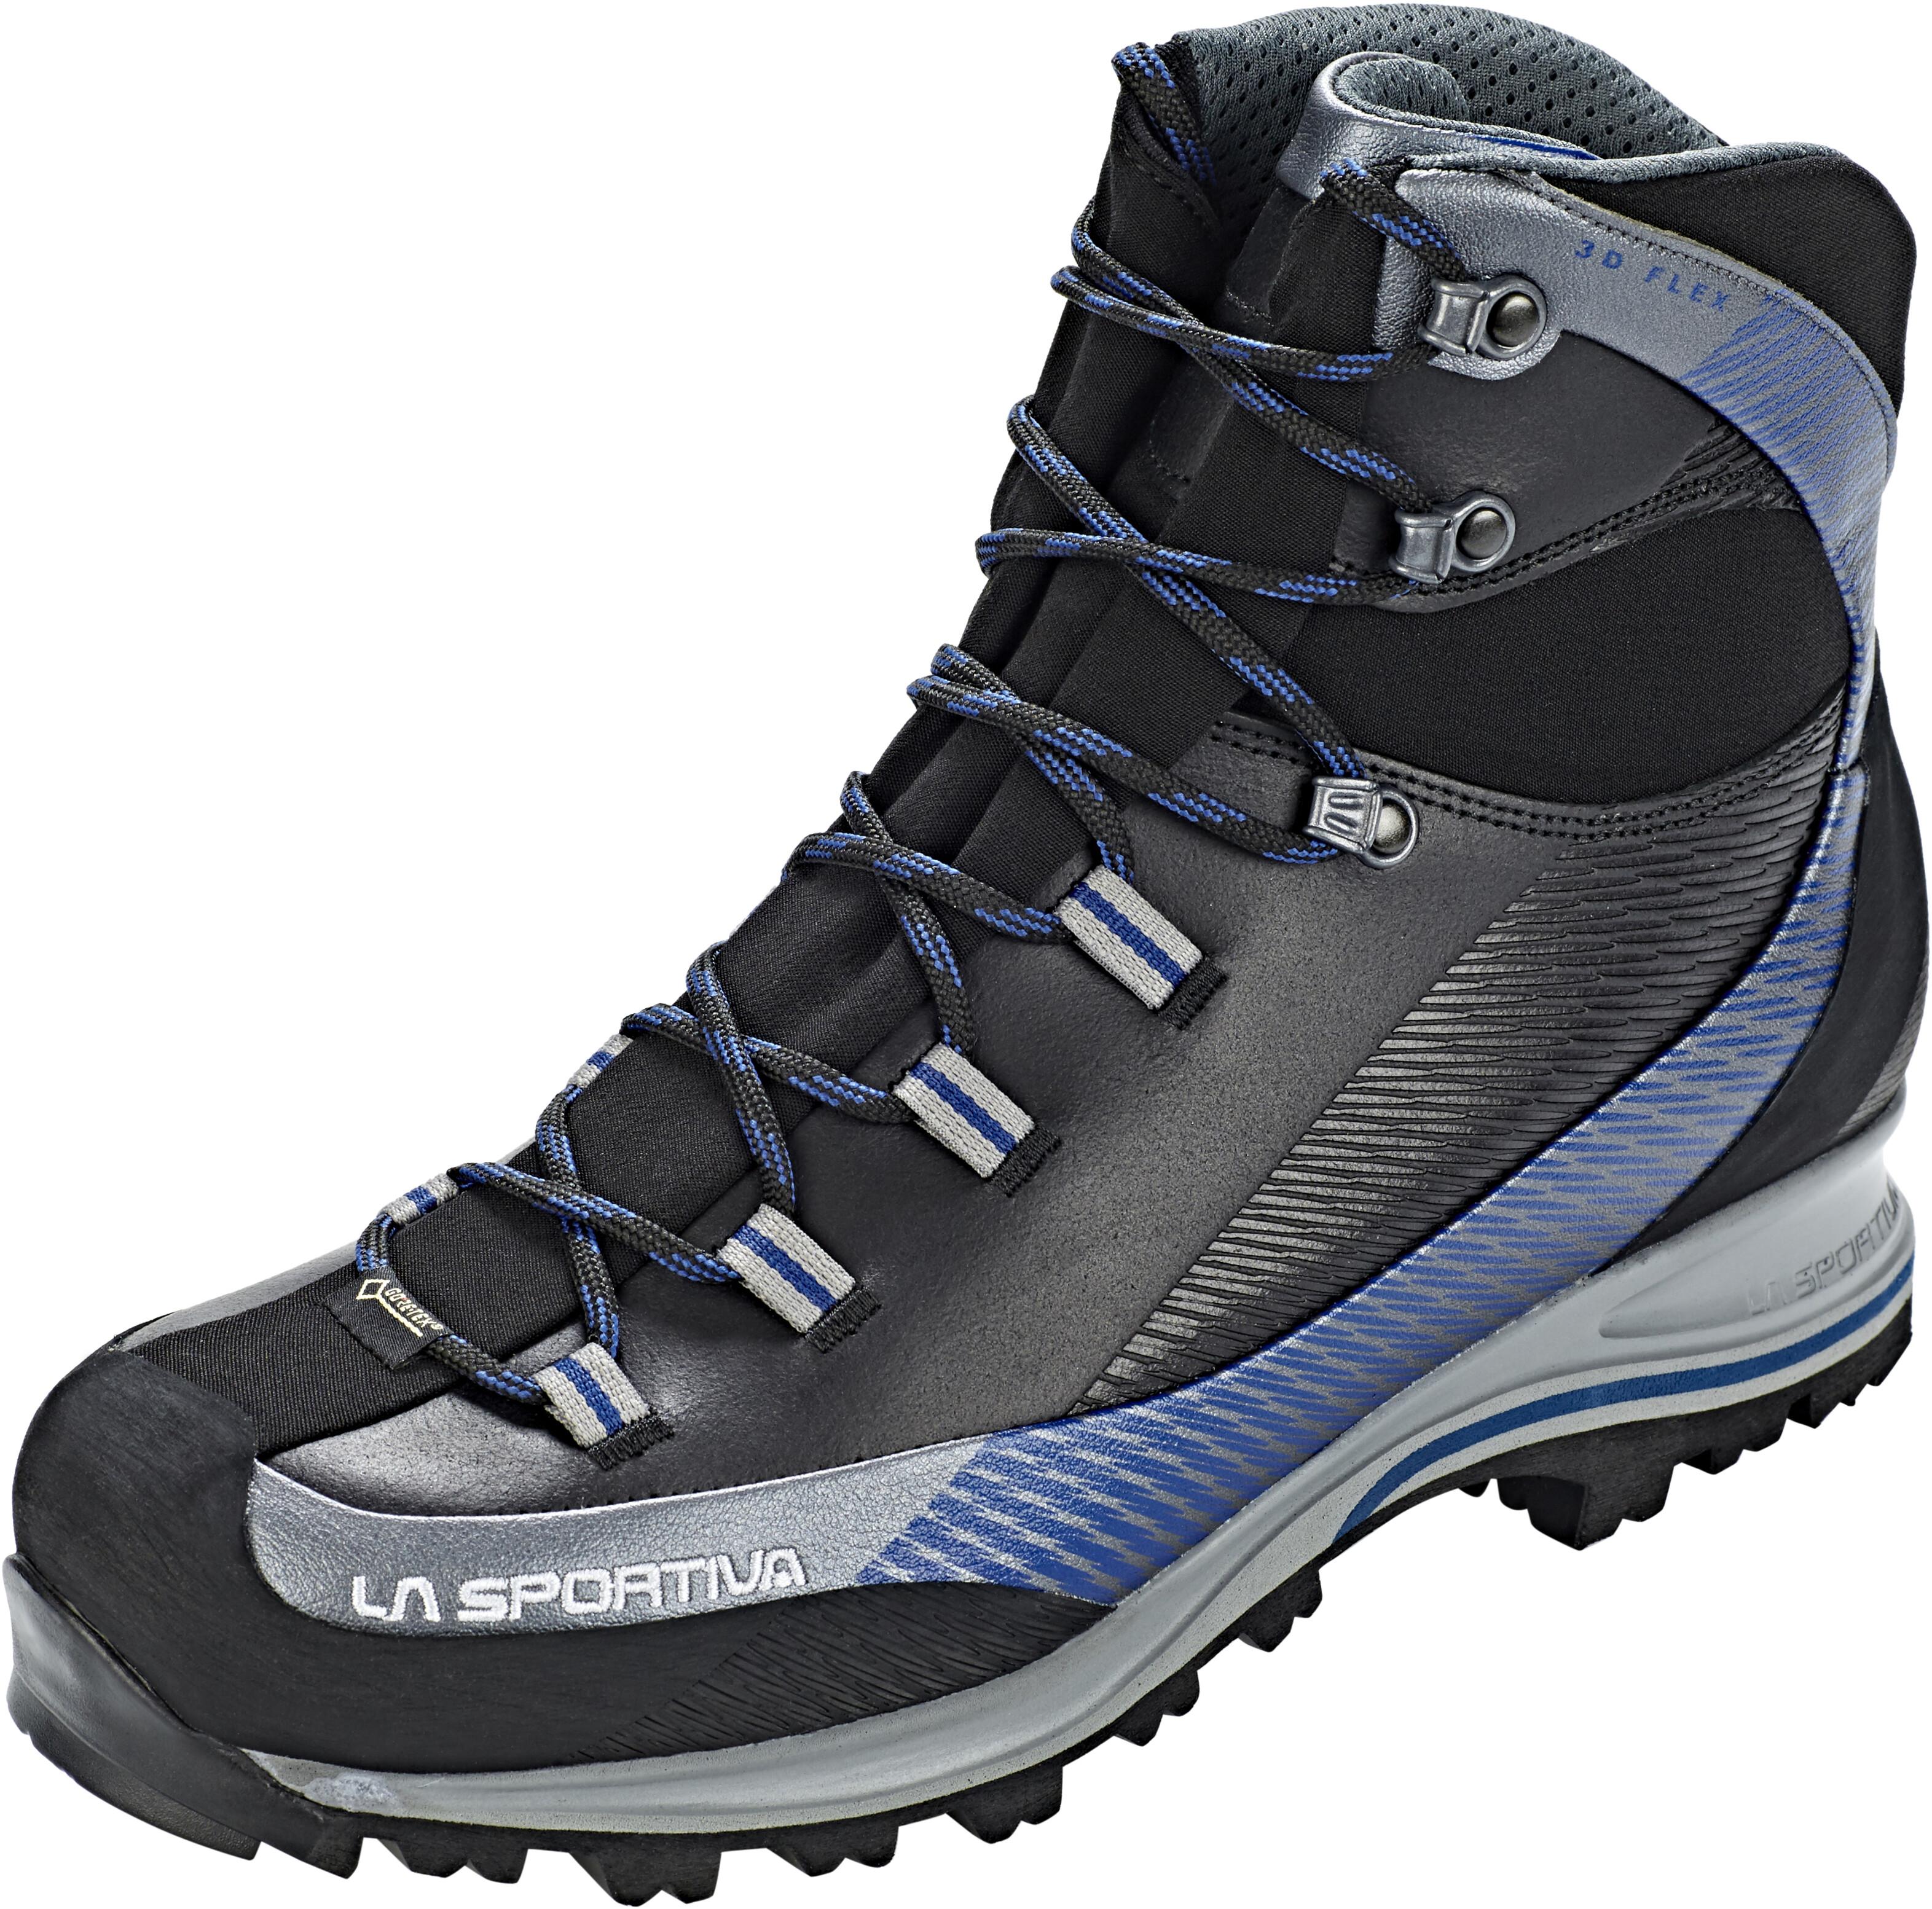 5ff0b7bad4a La Sportiva Trango TRK Leather GTX Shoes Men carbon/dark sea